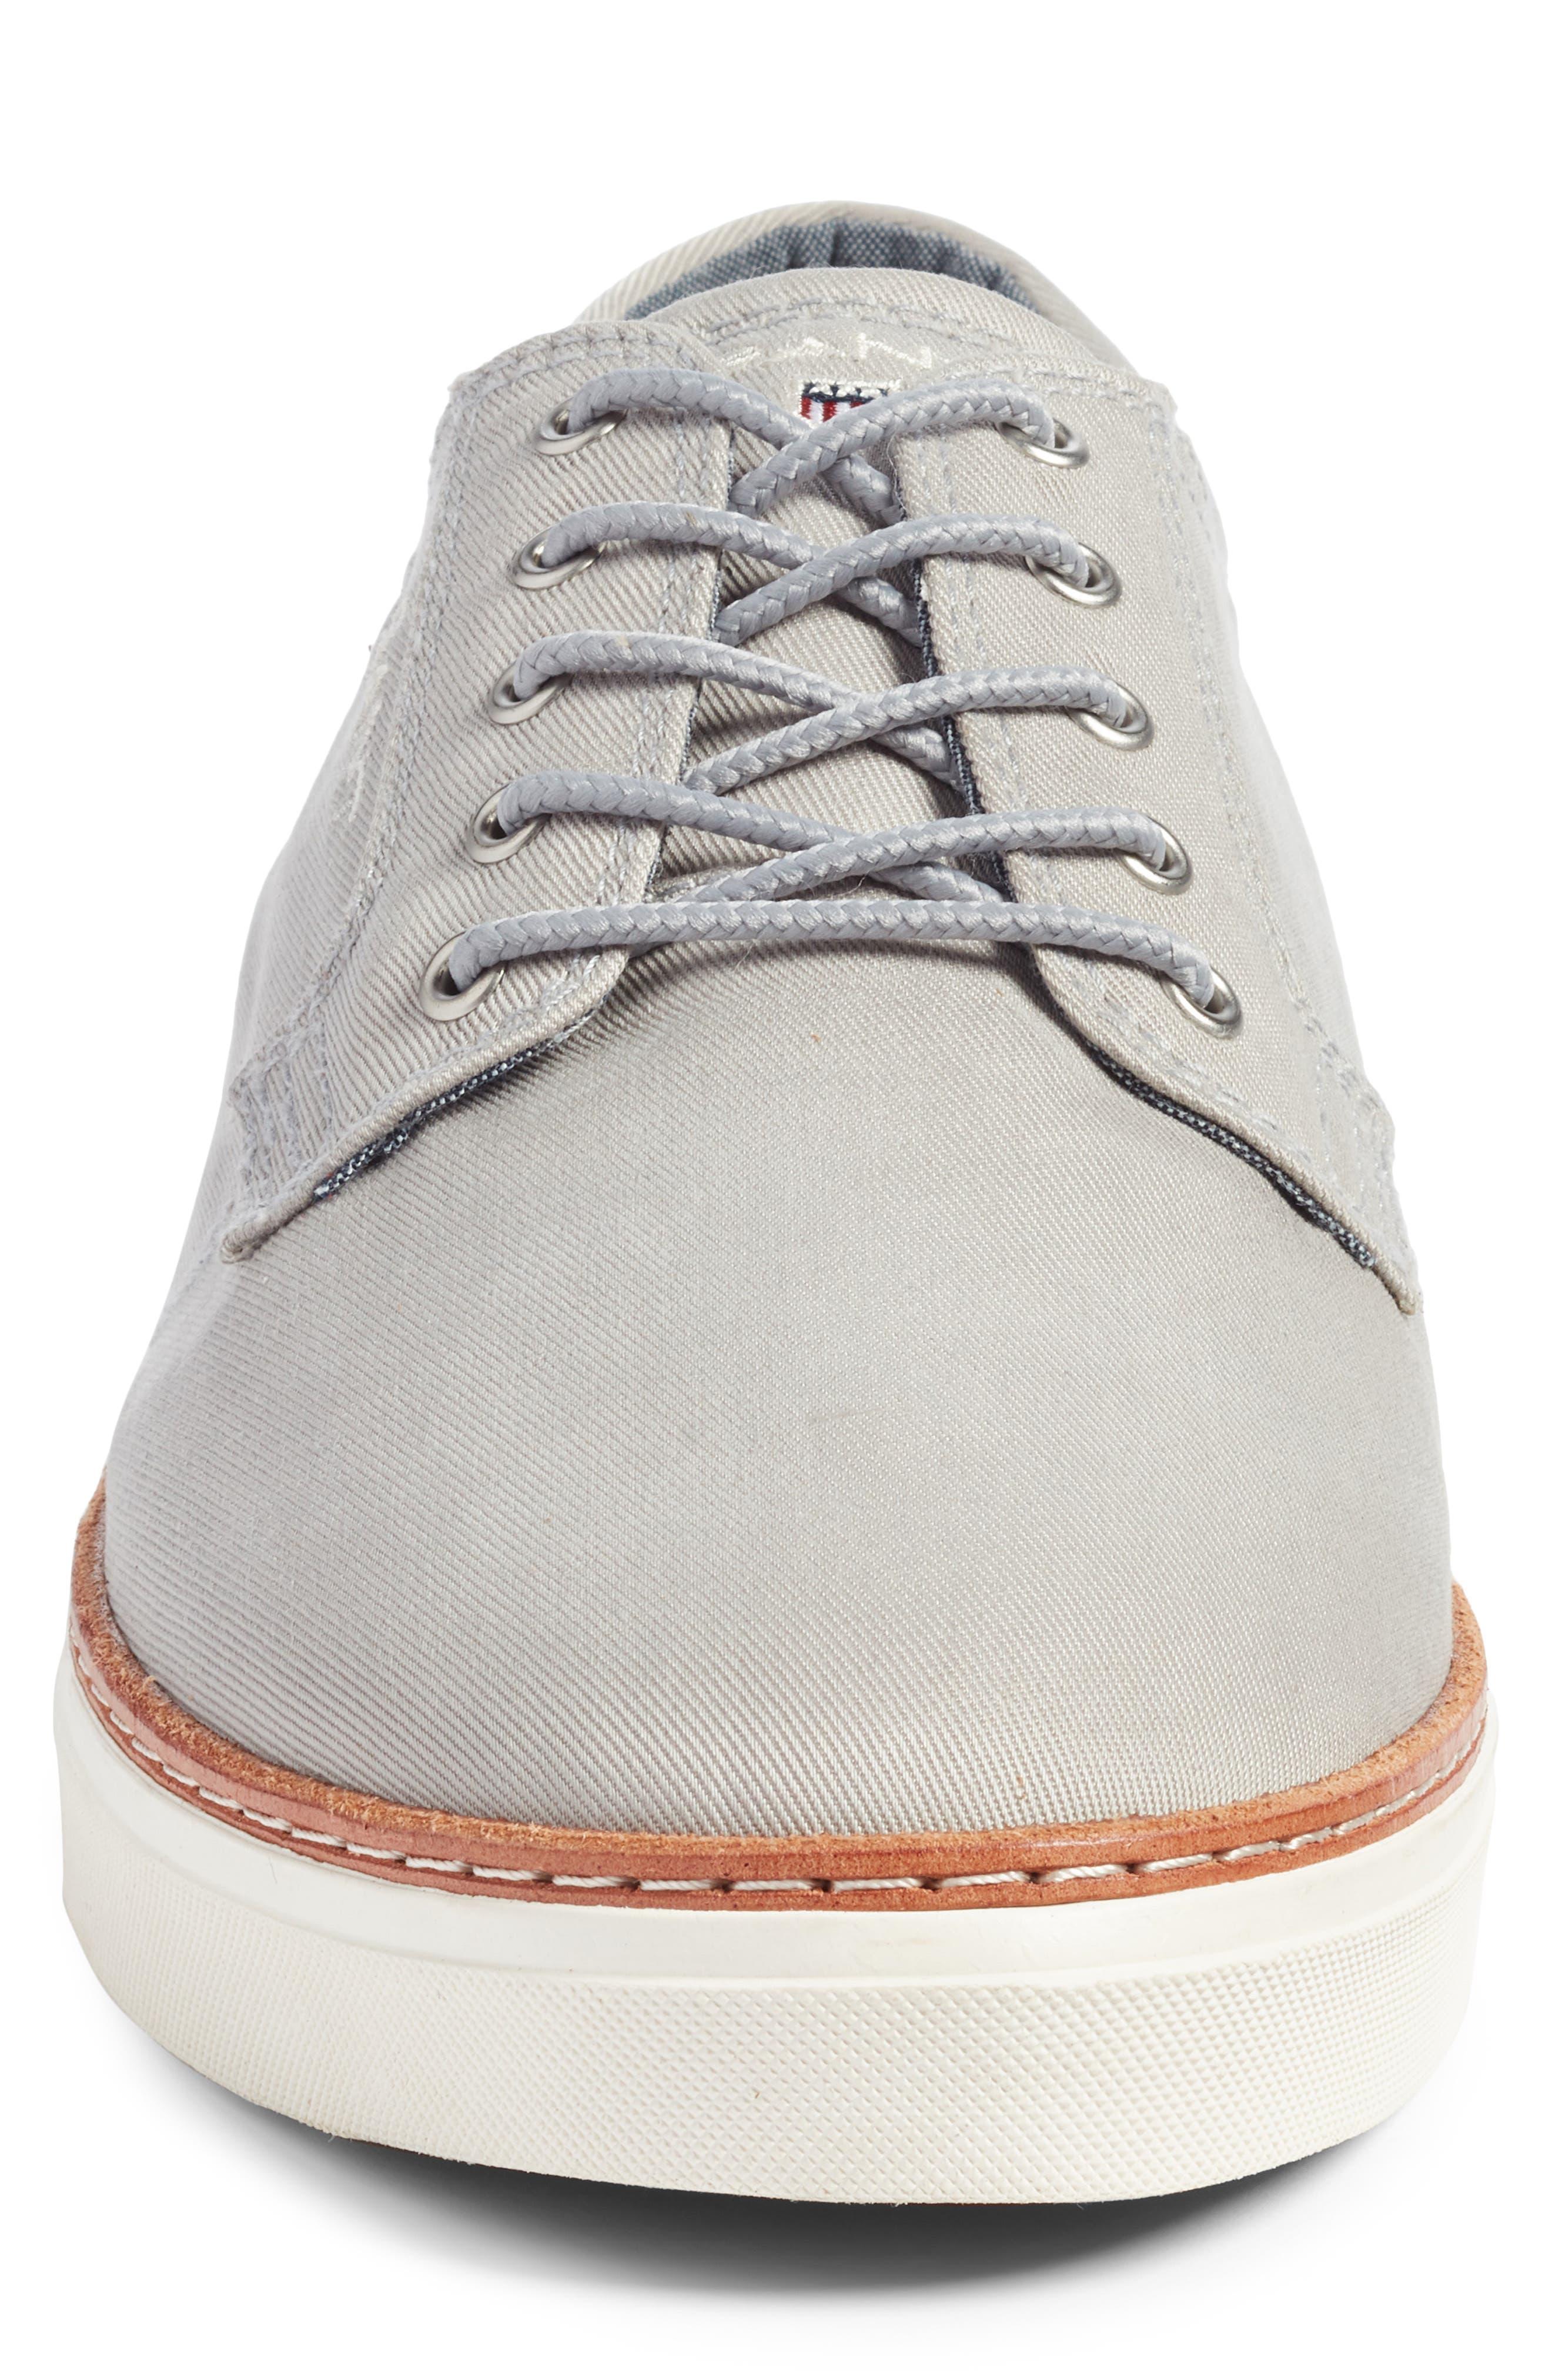 Bari Sneaker,                             Alternate thumbnail 4, color,                             SLEET GRAY